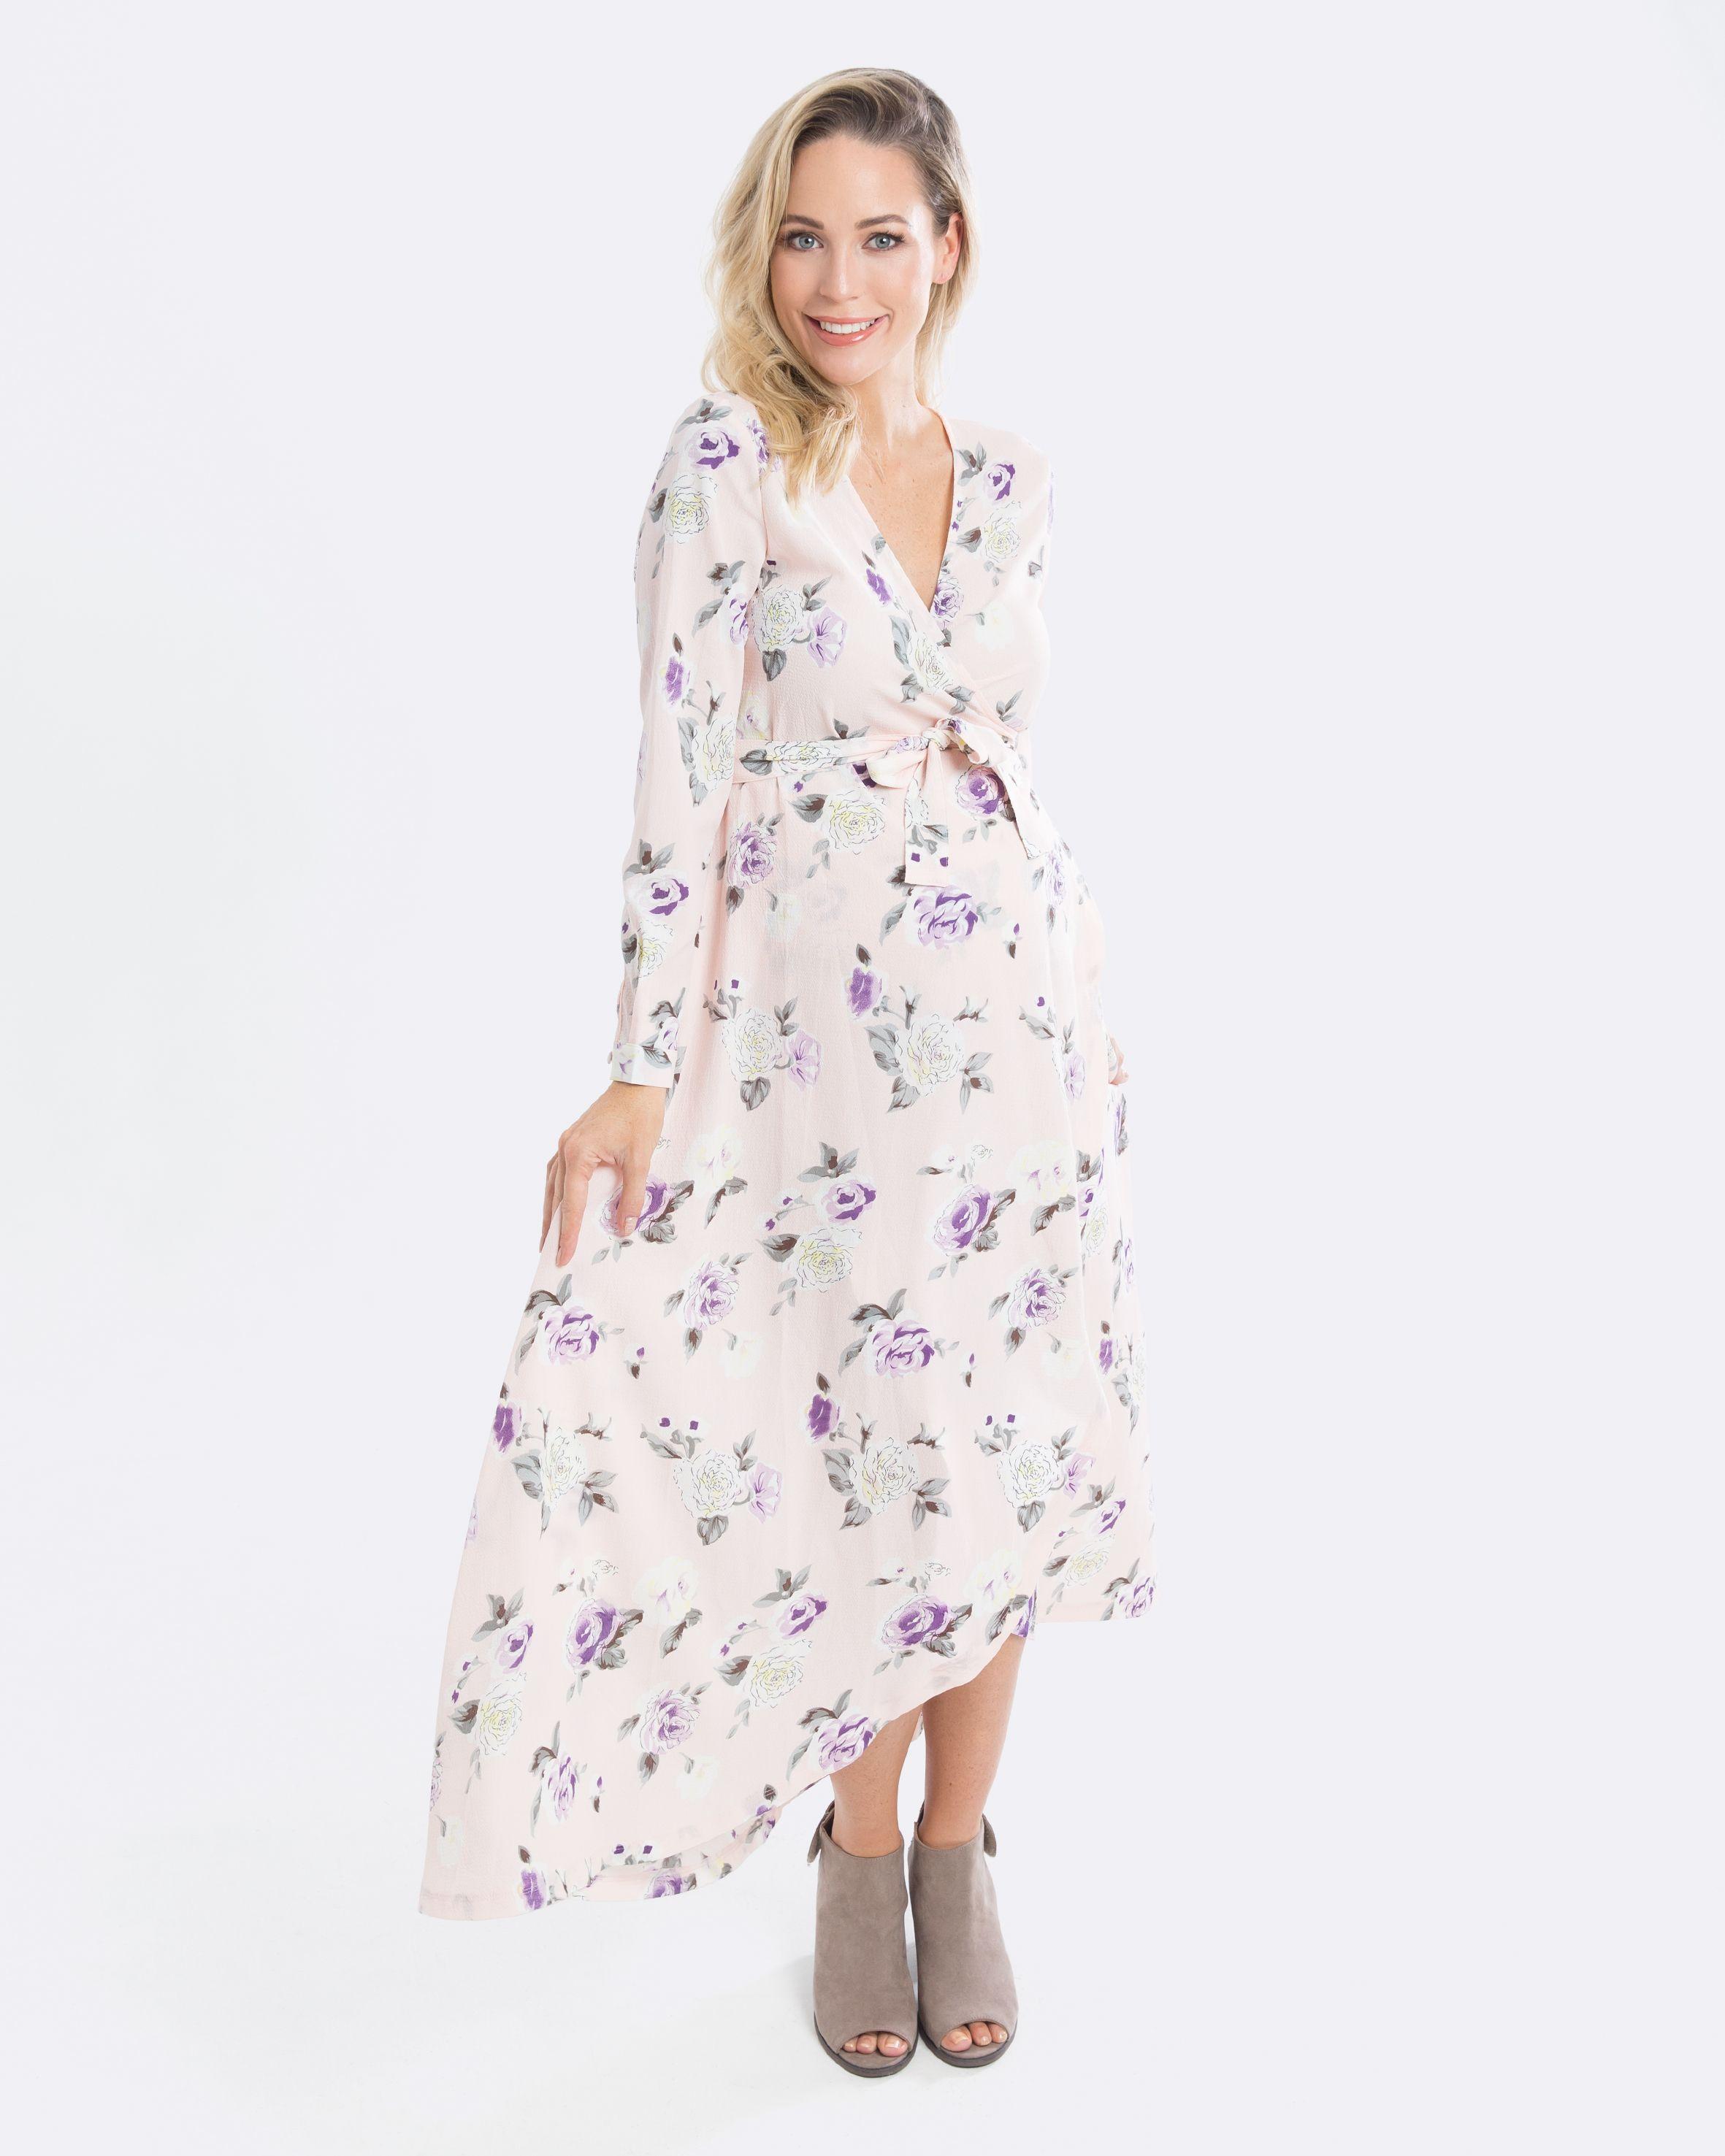 d9ee051d685b2 Pregnancy Wrap Dress - Pink Floral Maxi Maternity Dress - only $65 aud